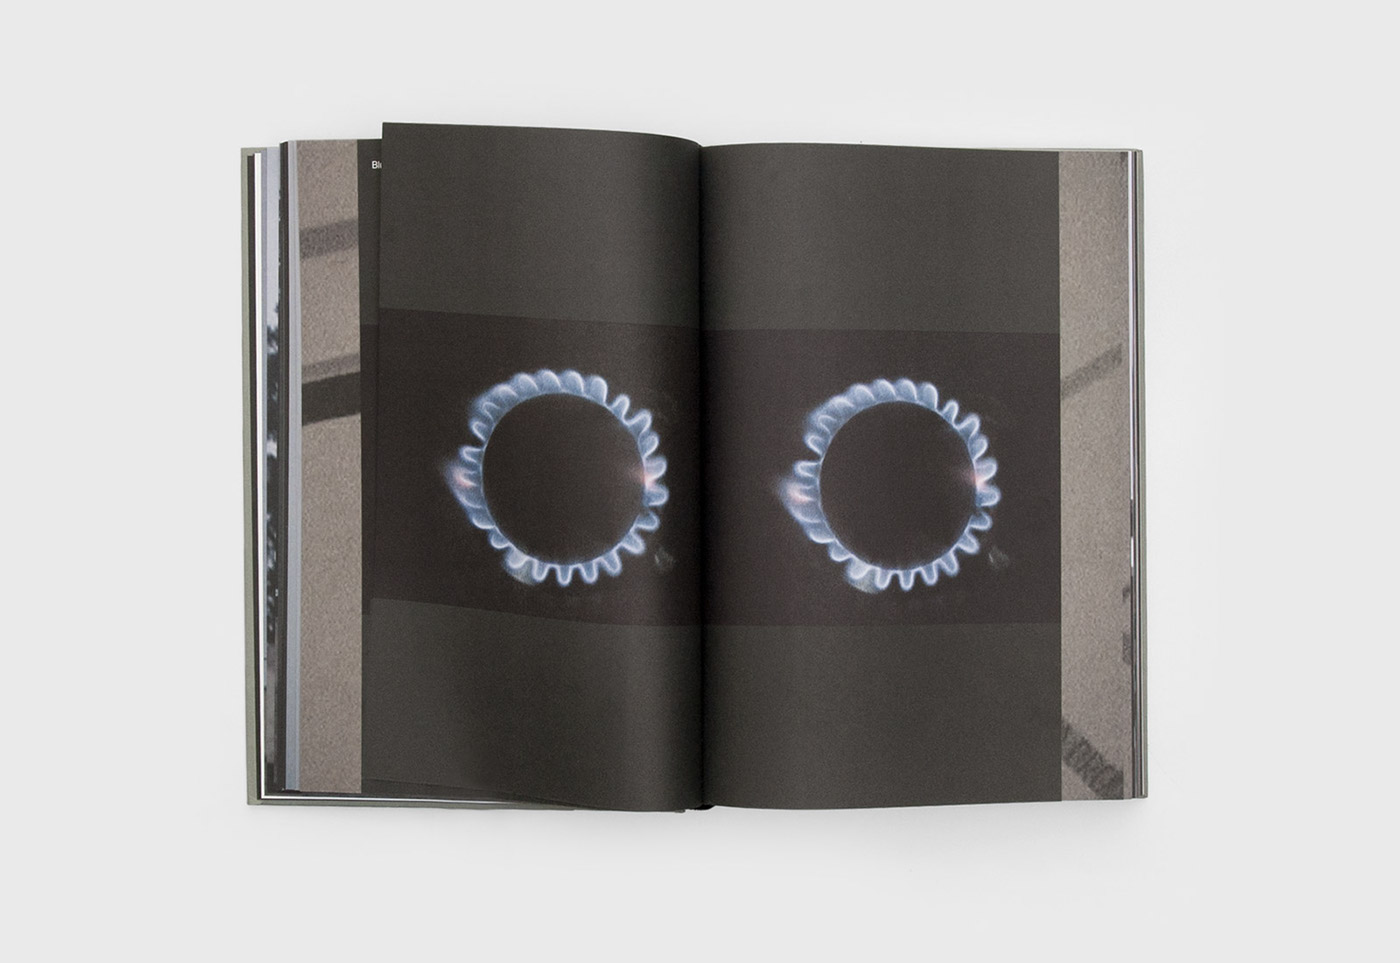 balka Miroslaw Balka gallery Exhibition  book design Album design Black Book